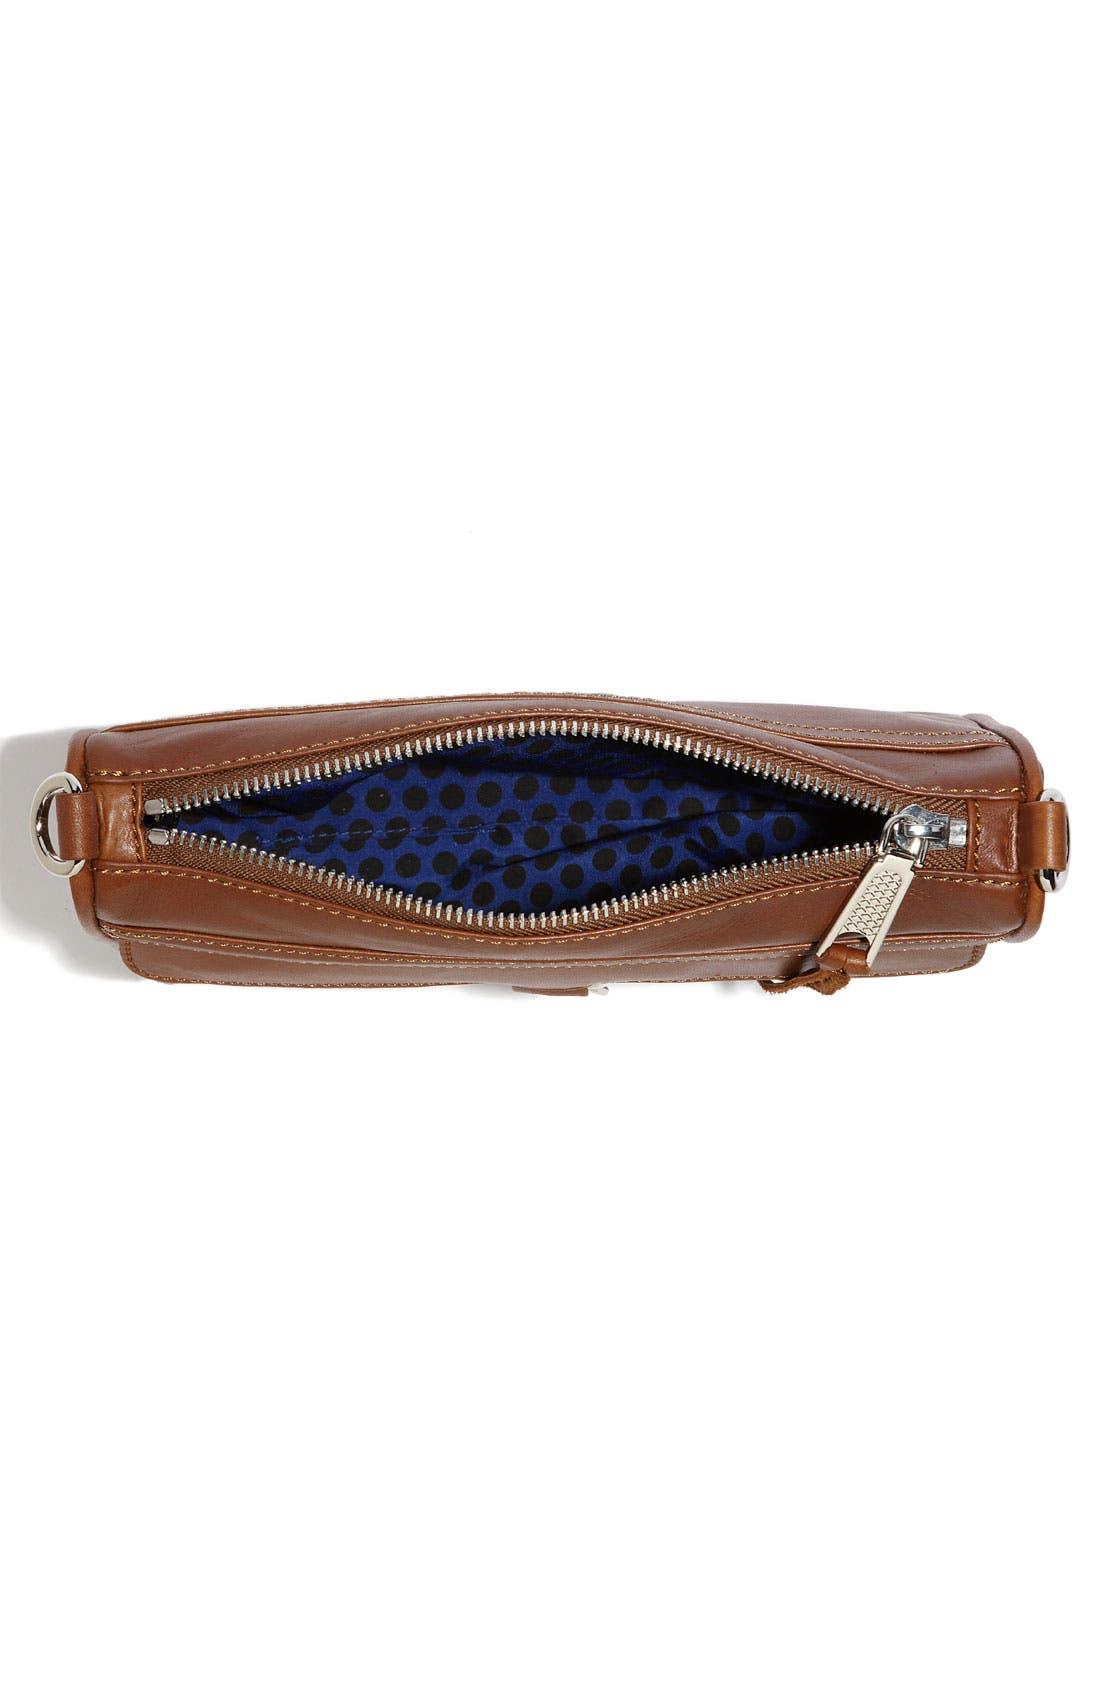 Alternate Image 3  - Rebecca Minkoff 'Mini MAC' Convertible Crossbody Bag